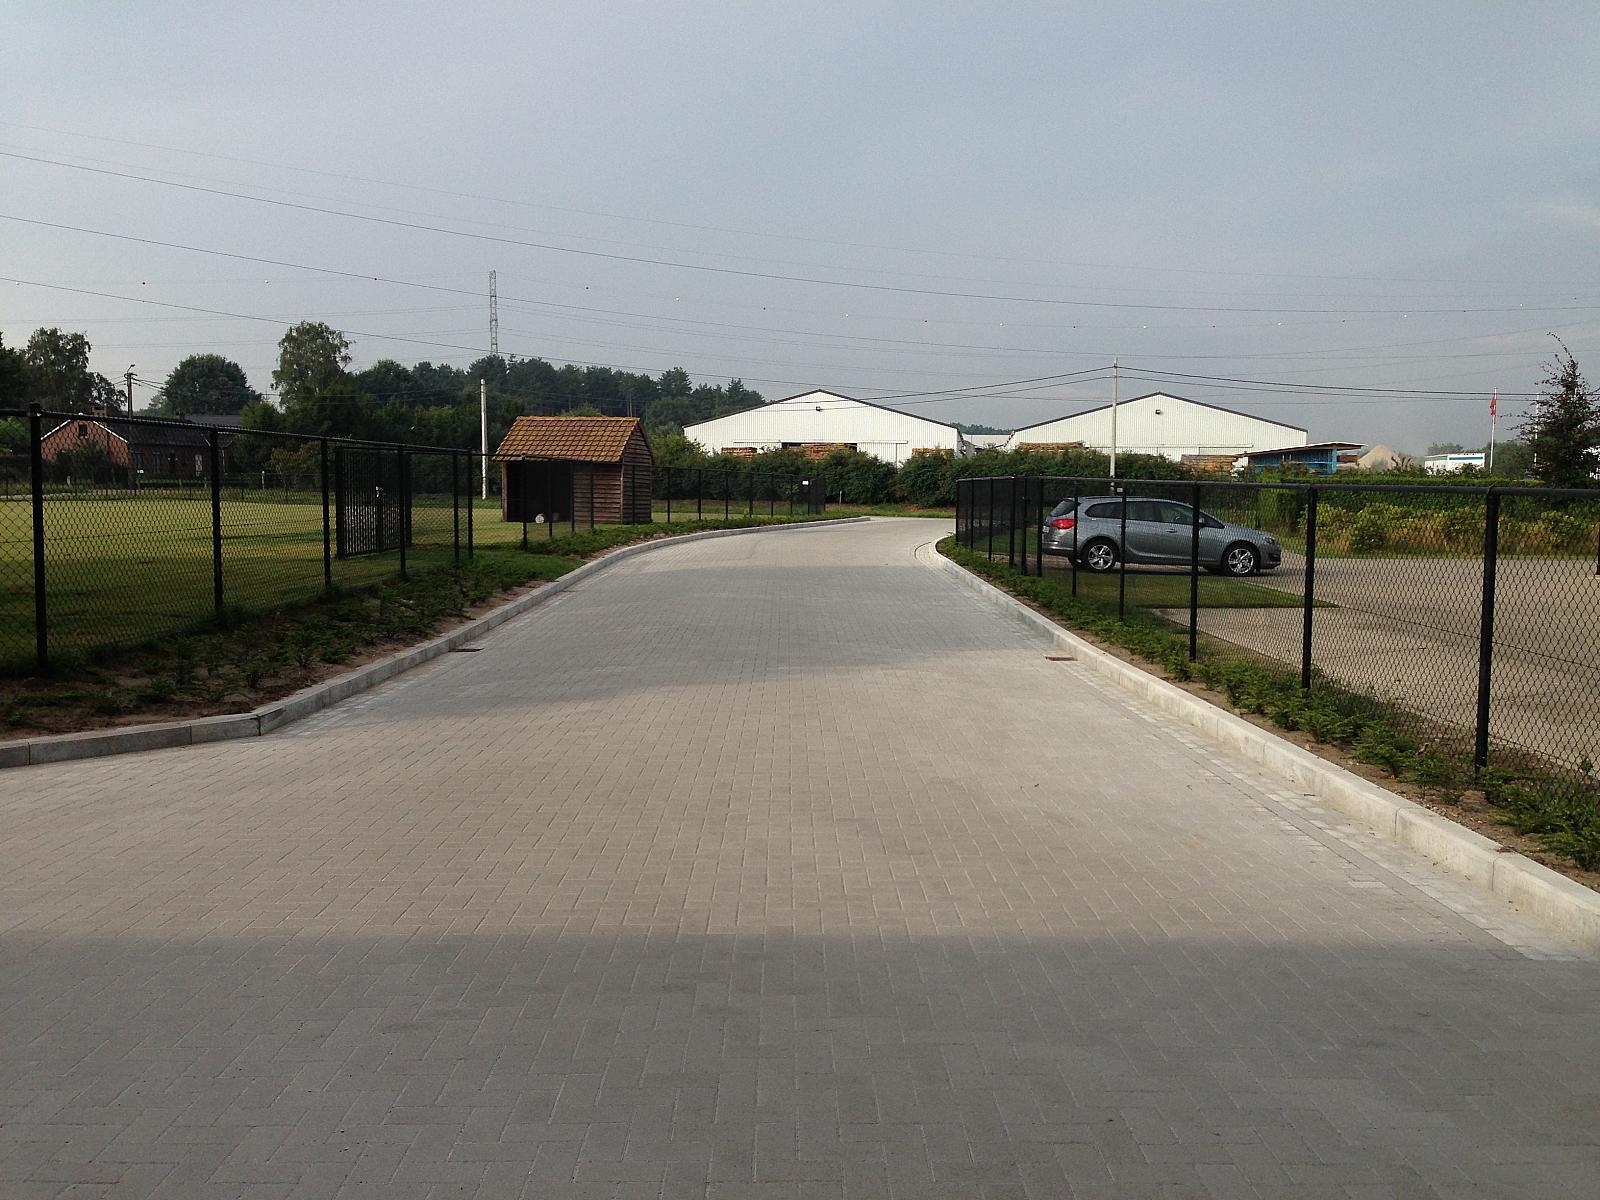 448-128-bmw-garage-meerhout